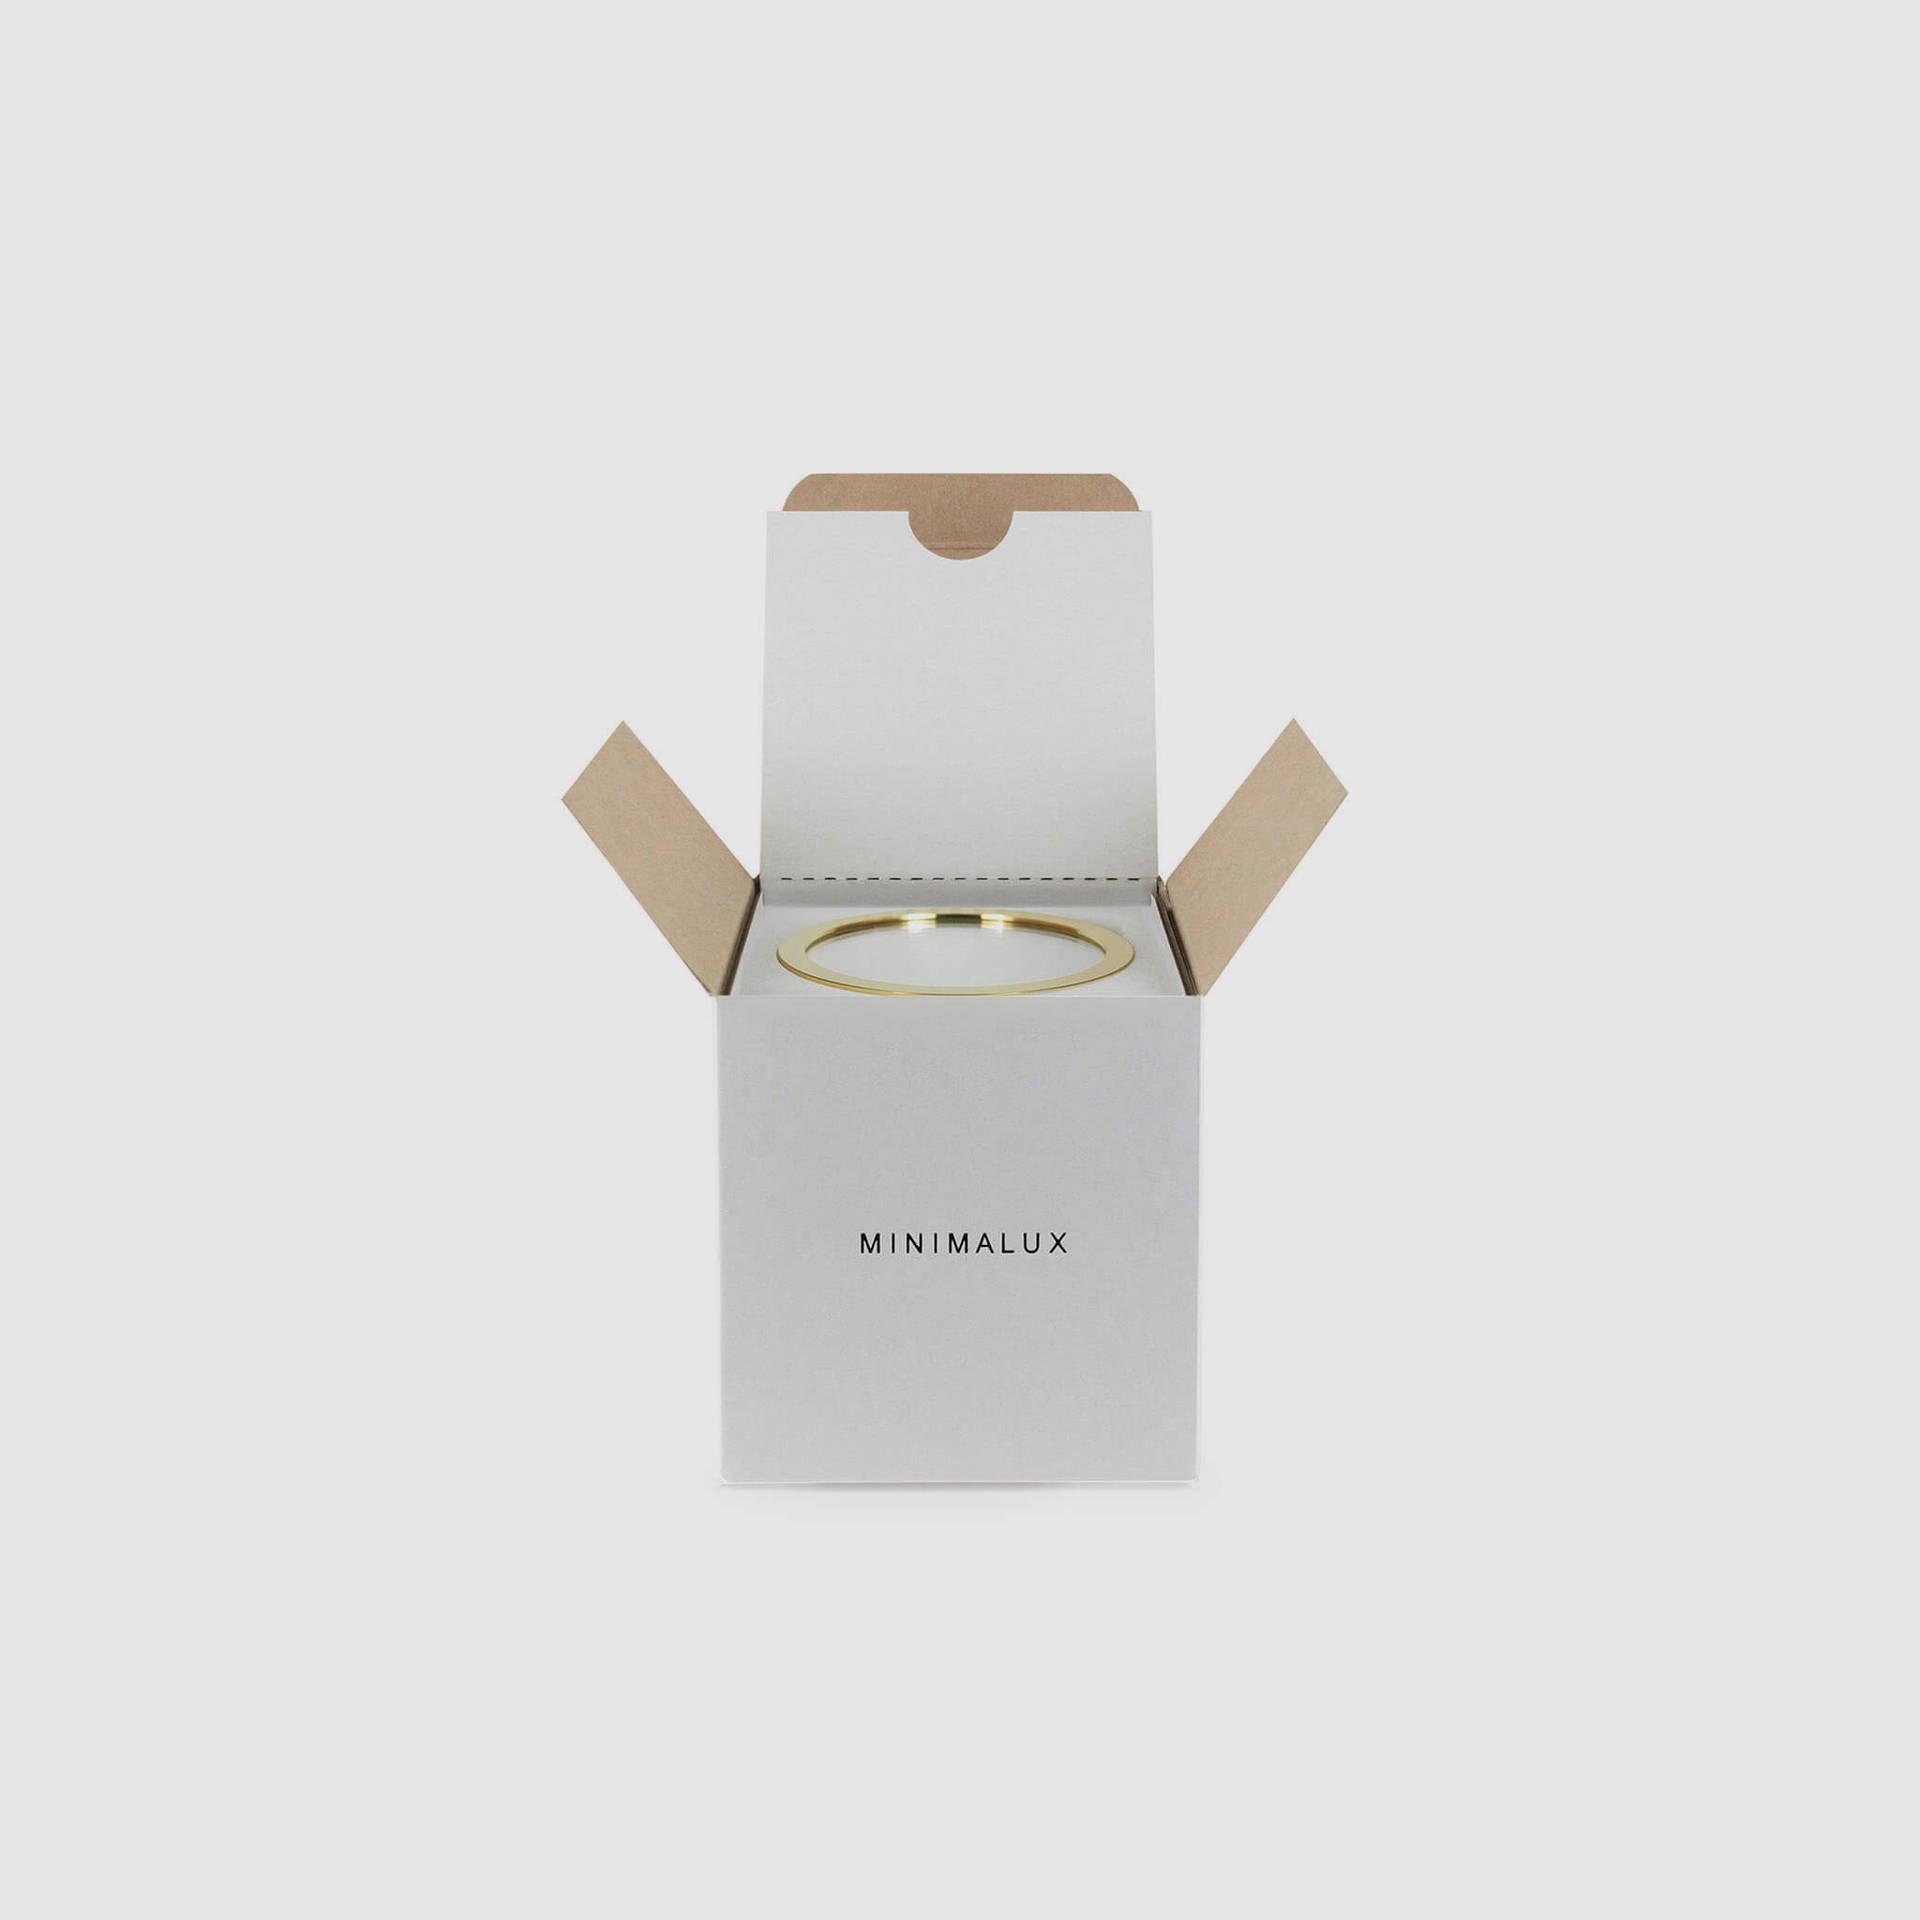 Pocket Mirror packaging